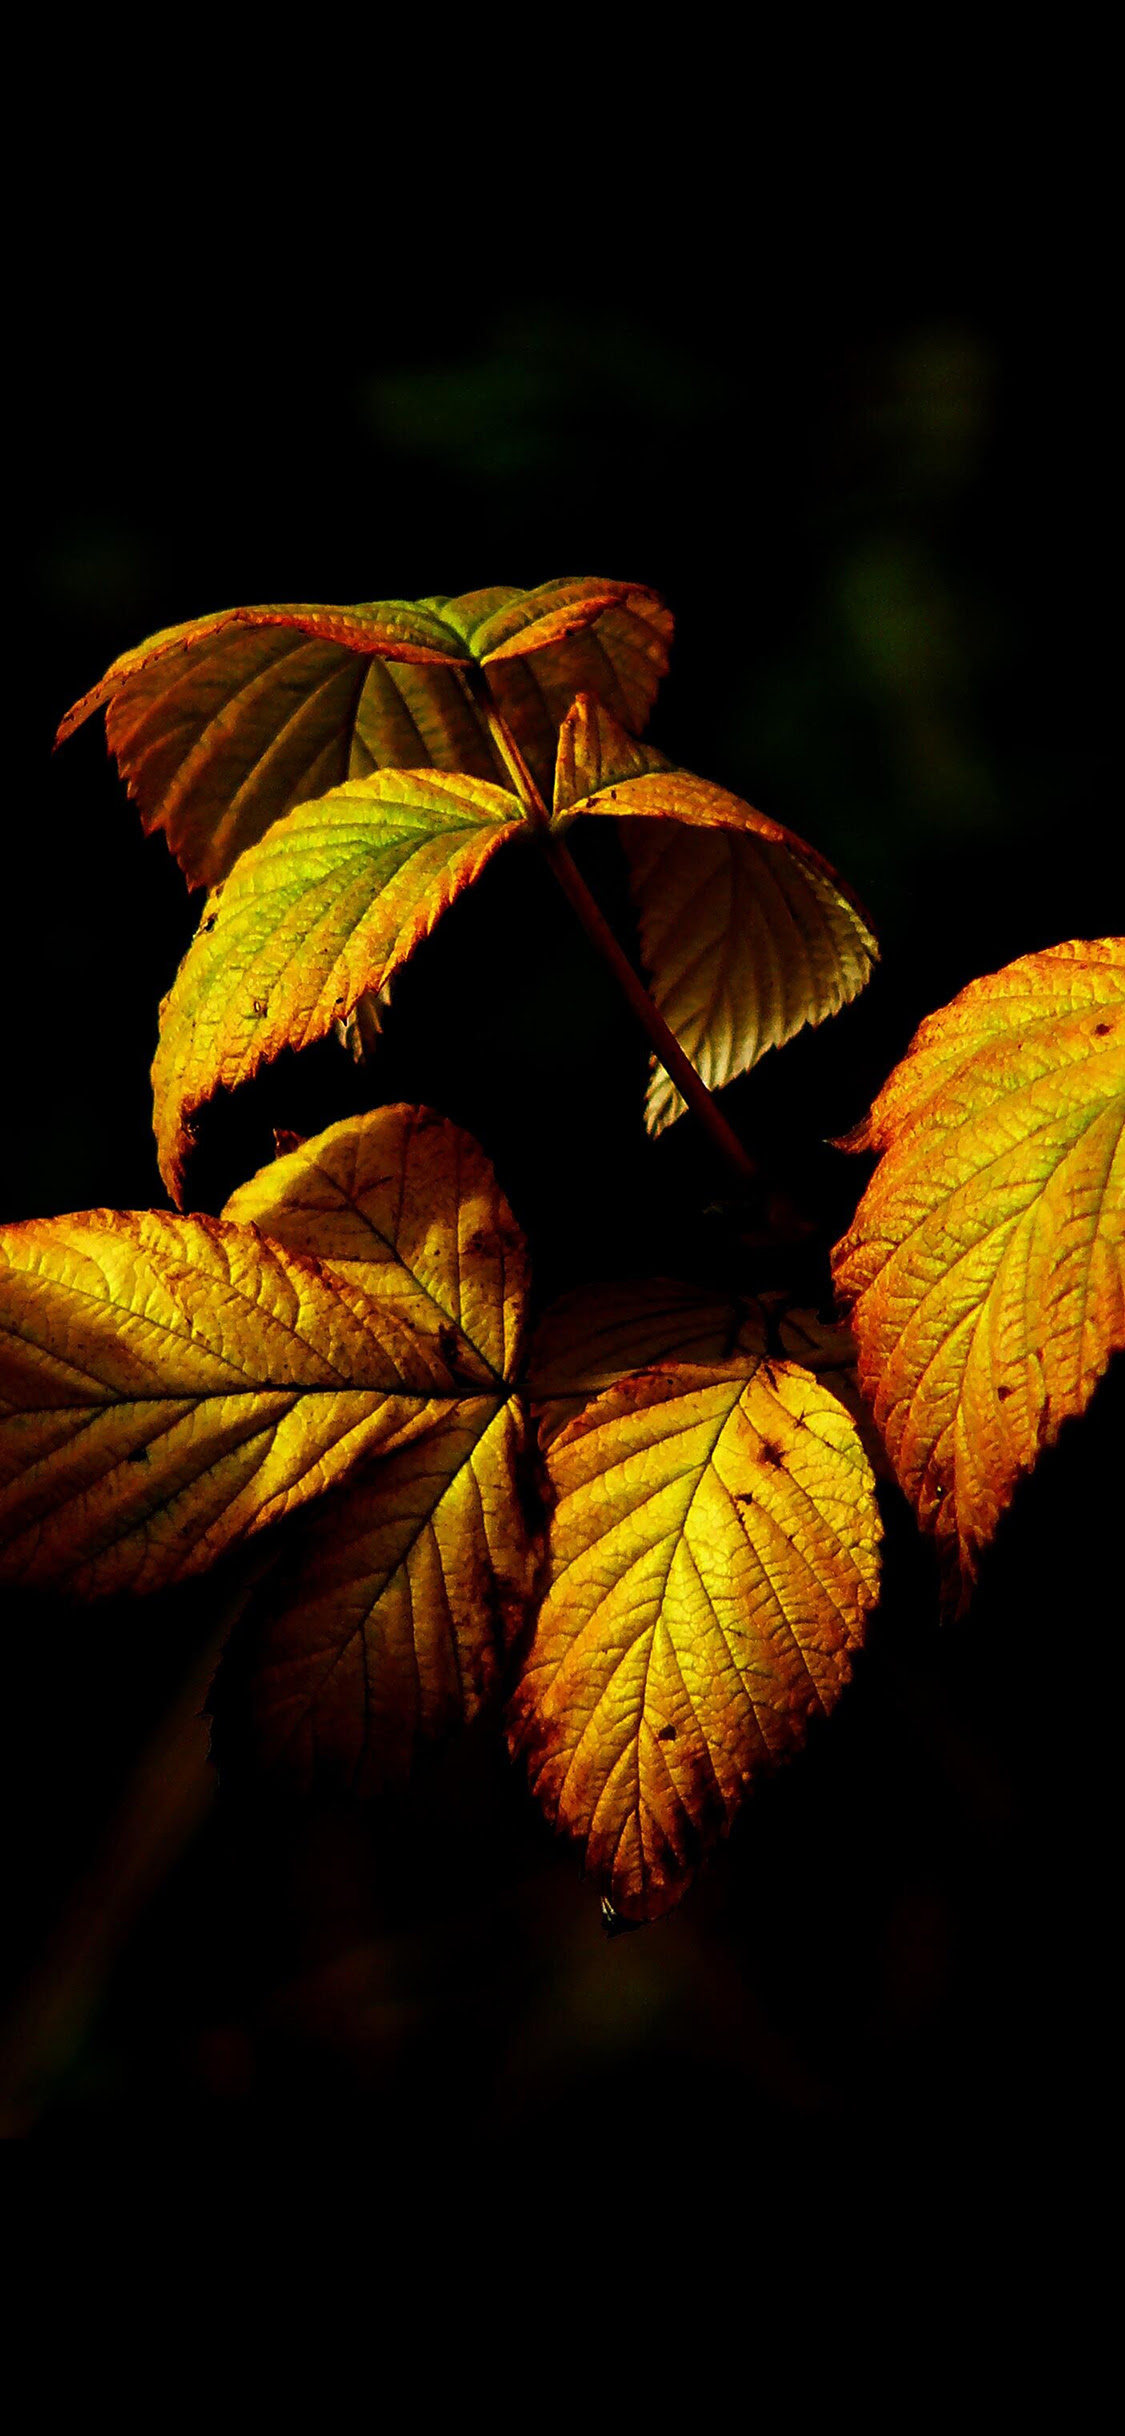 18 Dark Autumn Iphone Wallpaper Basty Wallpaper